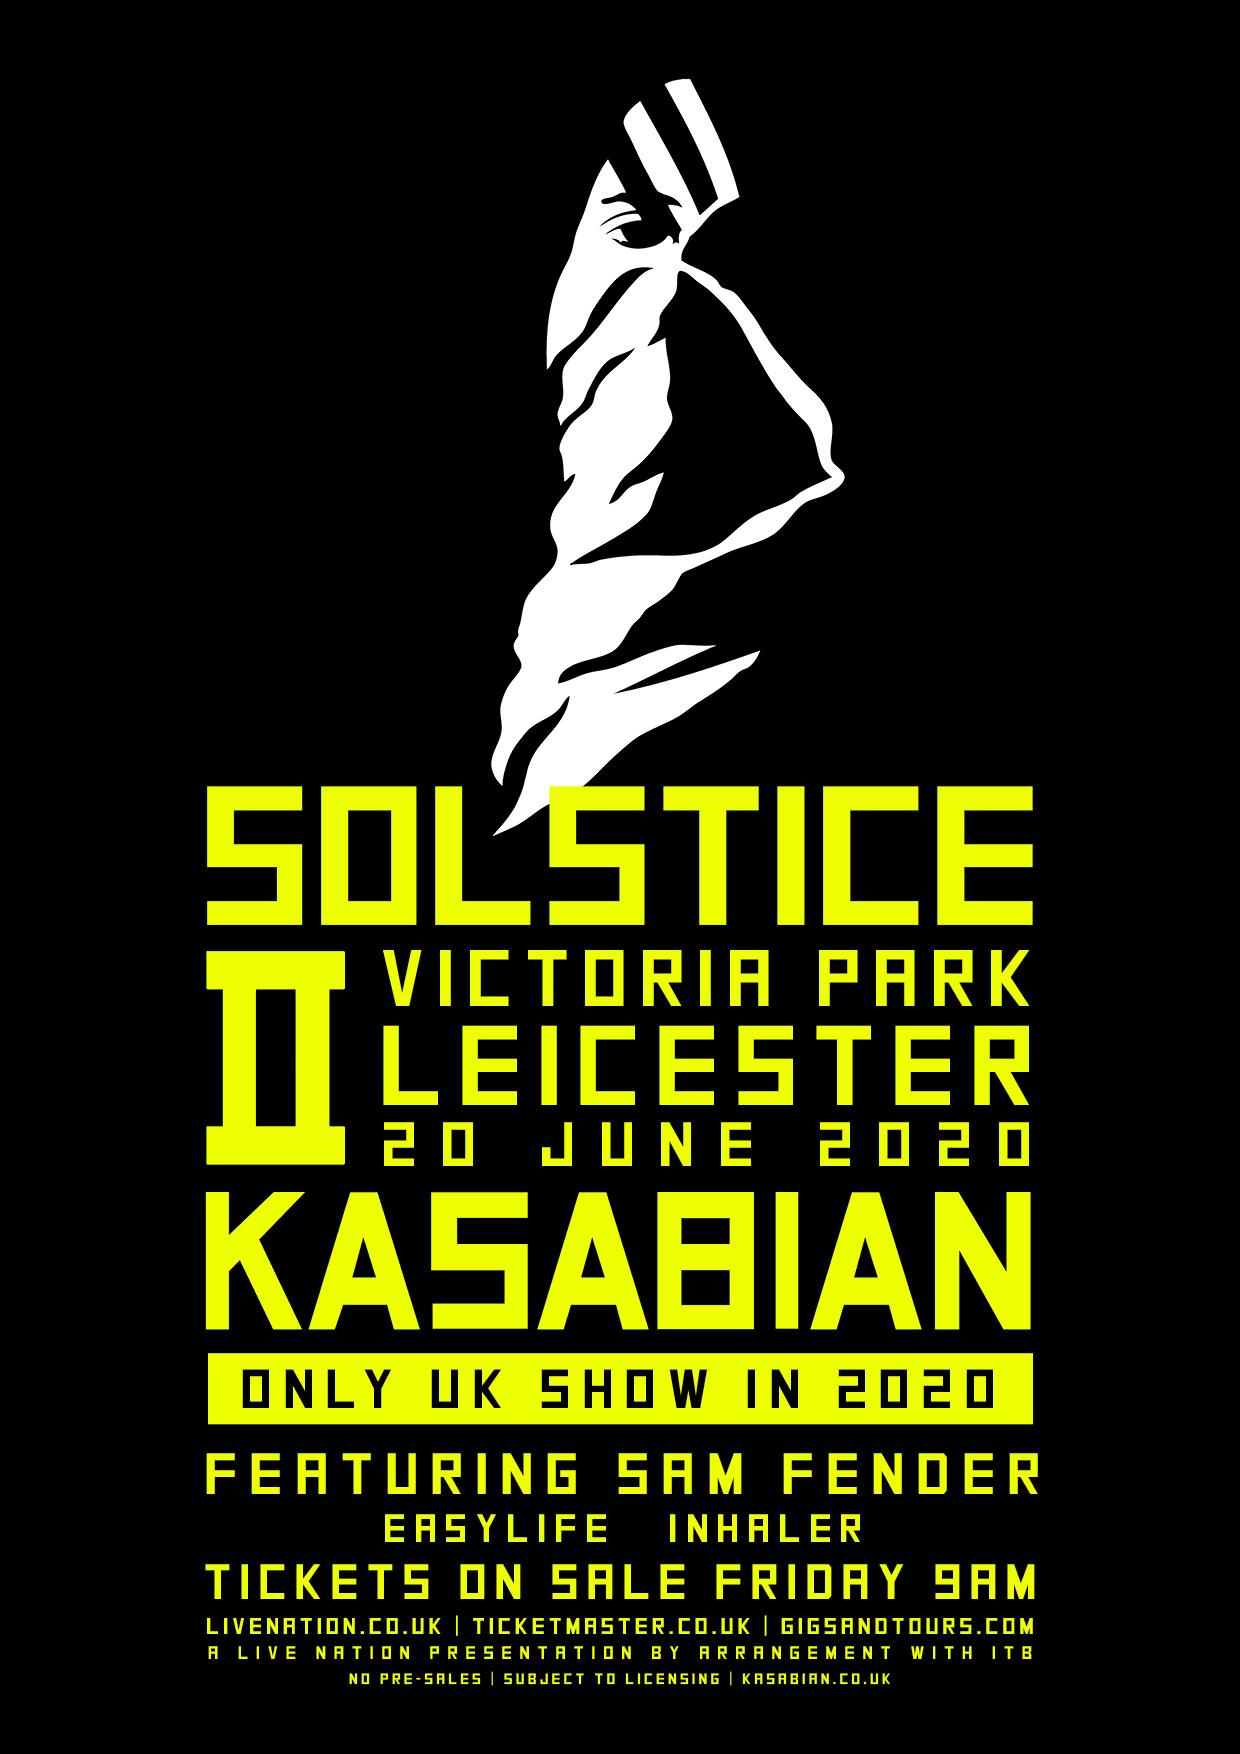 Kasabian announce huge hometown 2020 show